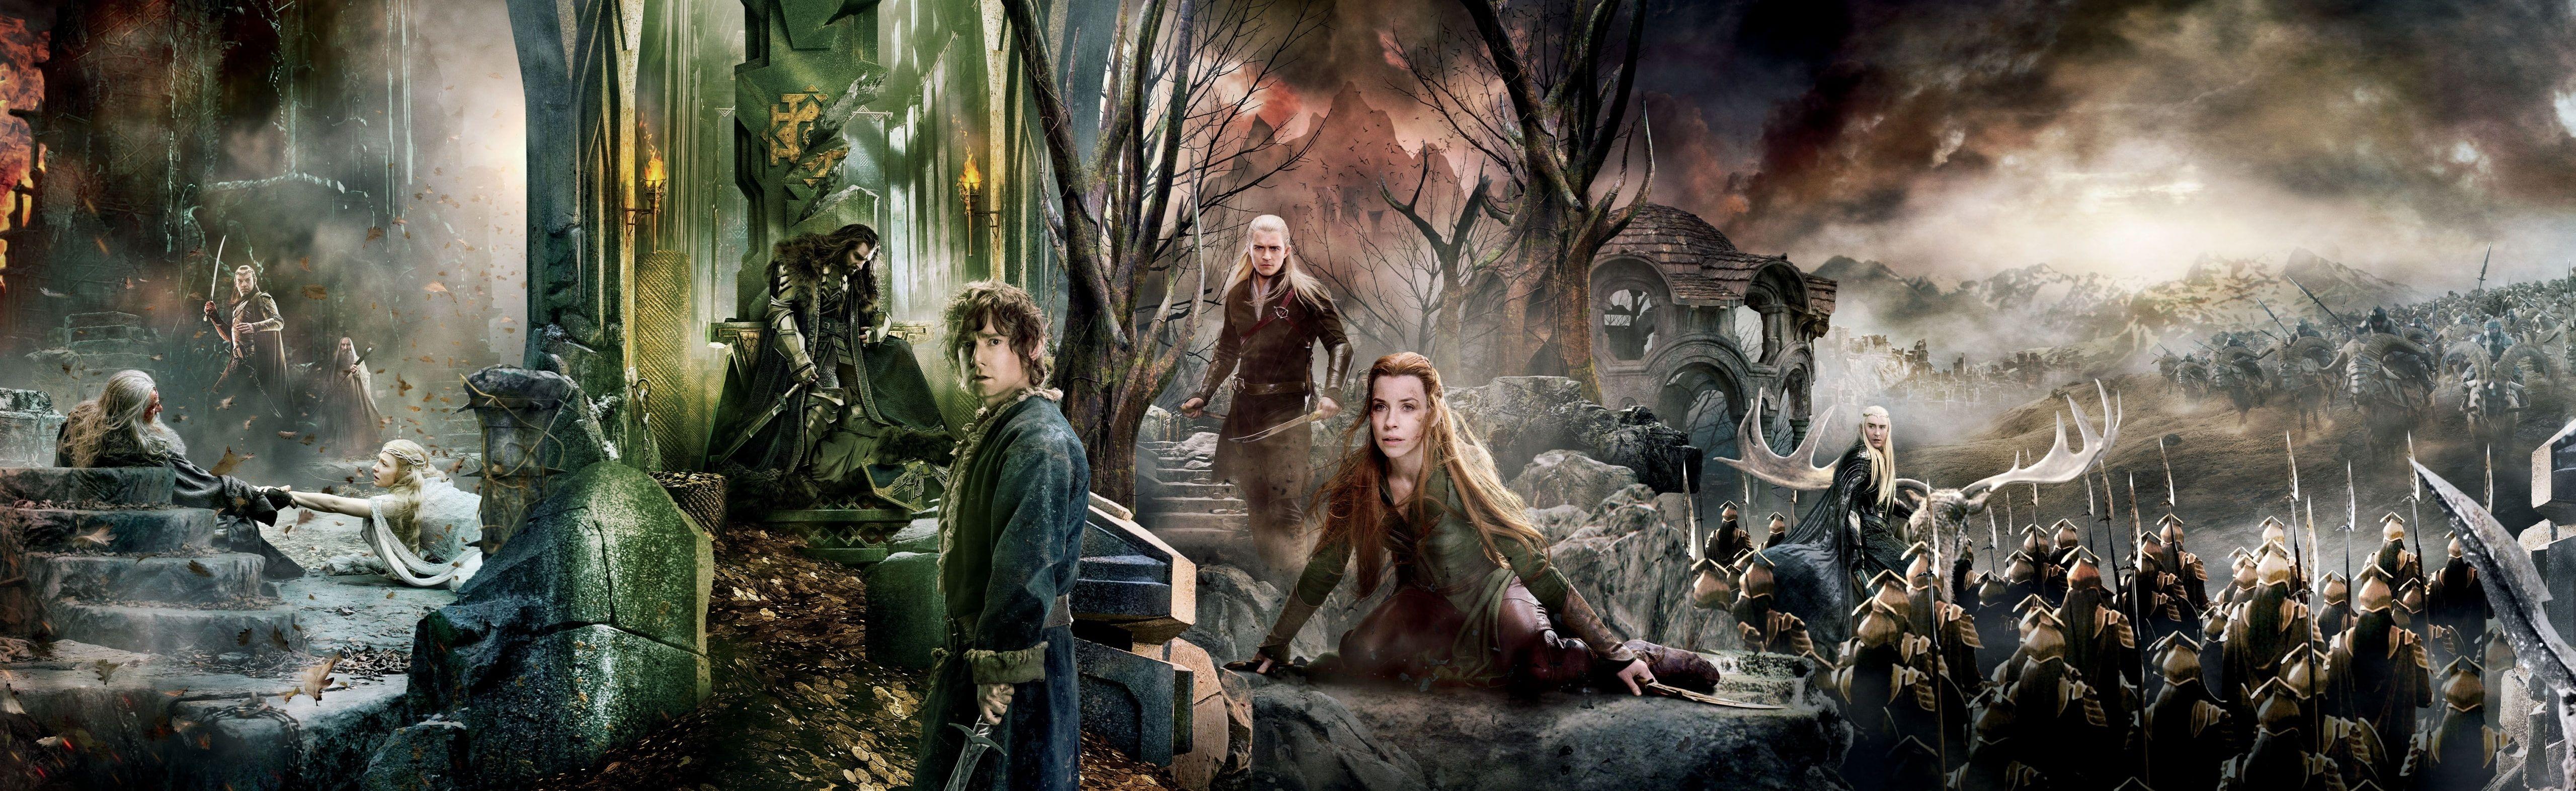 The Hobbit The Battle Of The Five Armies Dual The Hobbit Wallpaper Movies The Hobbit Gandalf Bilbo Baggins Bard The Bow The Hobbit Hd Wallpaper Wallpaper